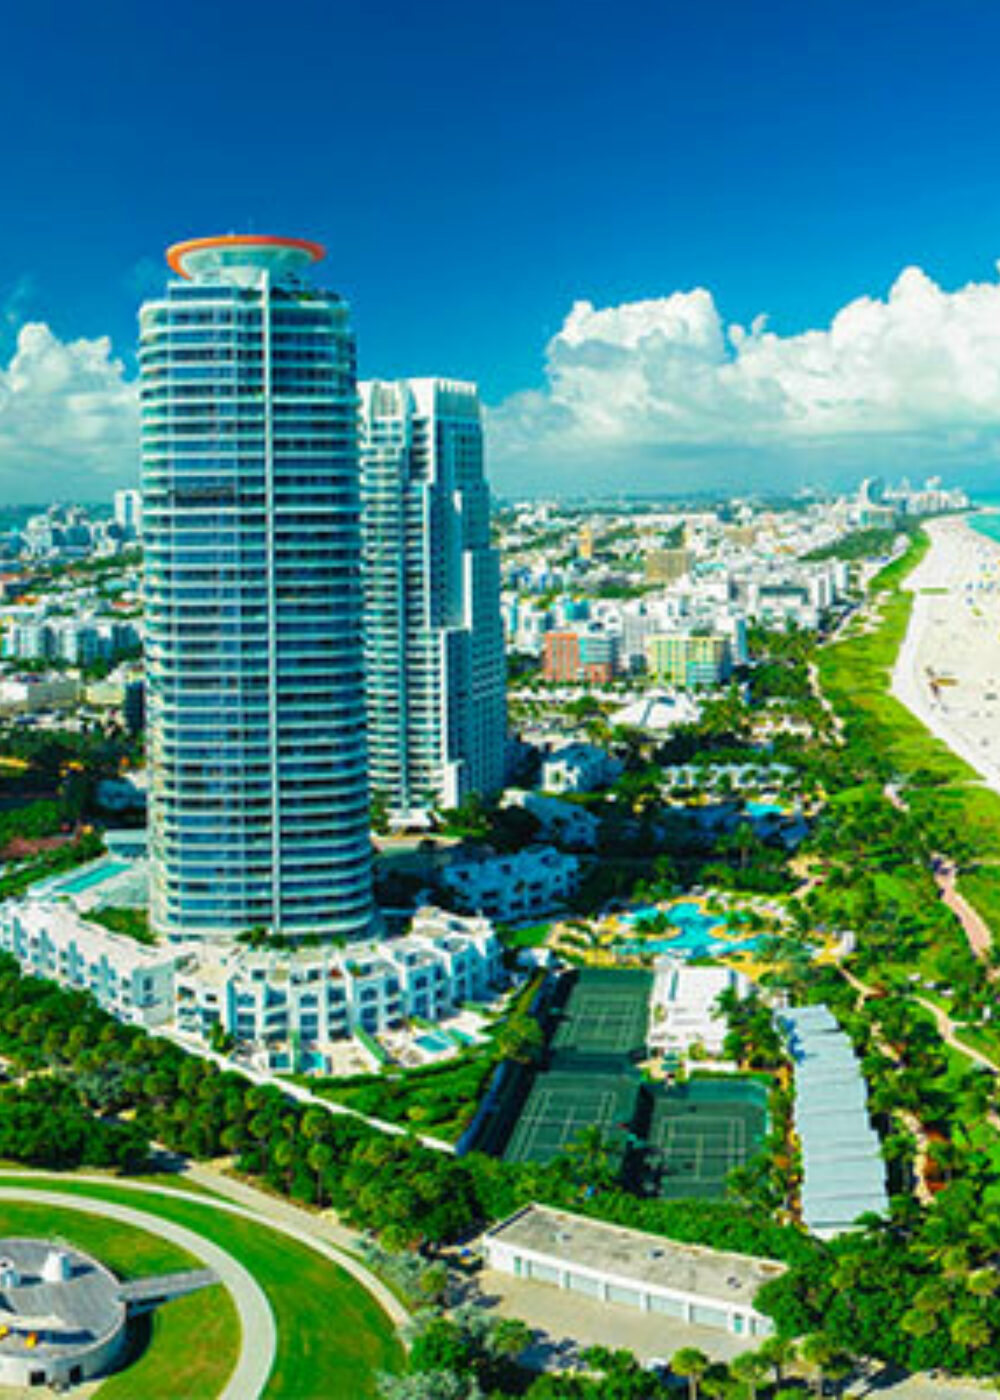 Green Motion Car Rental United States Florida Miami Beach 1400x400